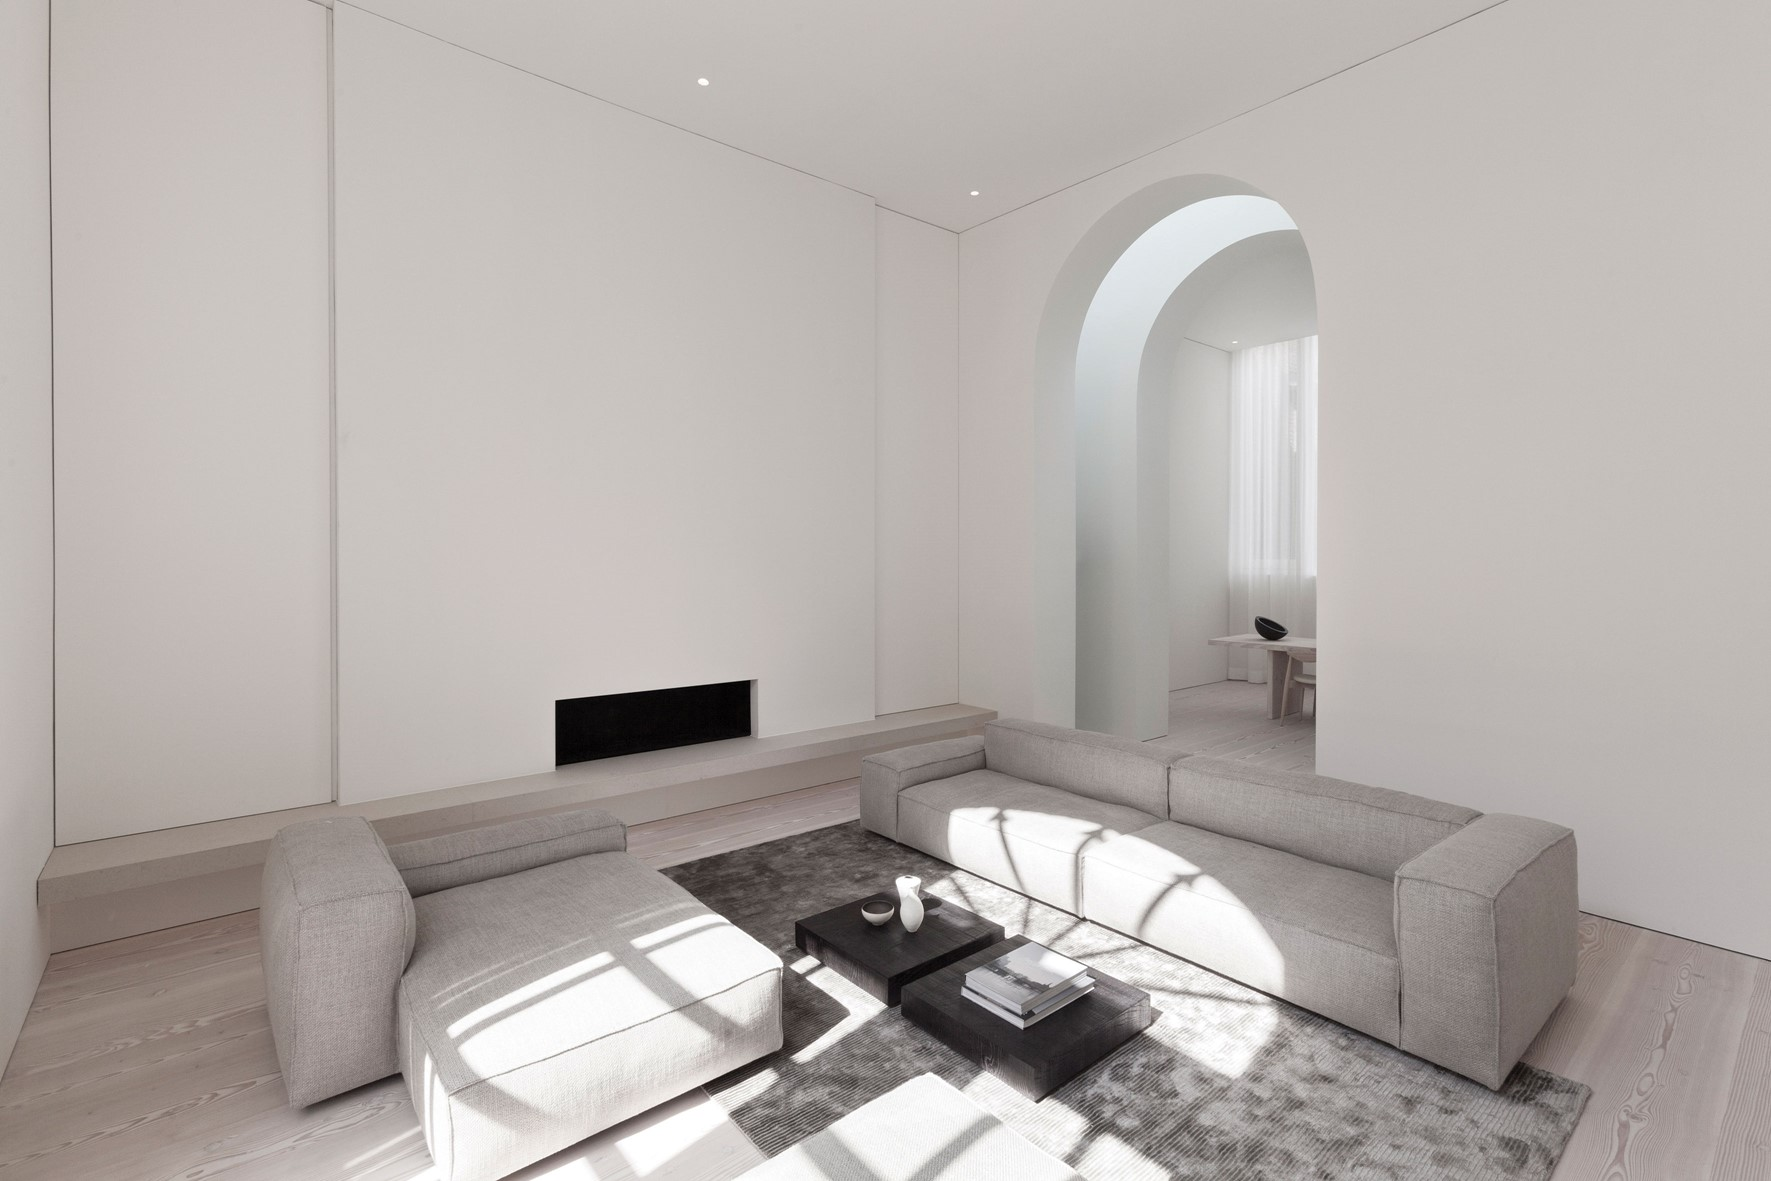 douglas-plank-floor_lye-and-natural-oil_coach-house-amsterdam_living-room-interior_dinesen.jpg